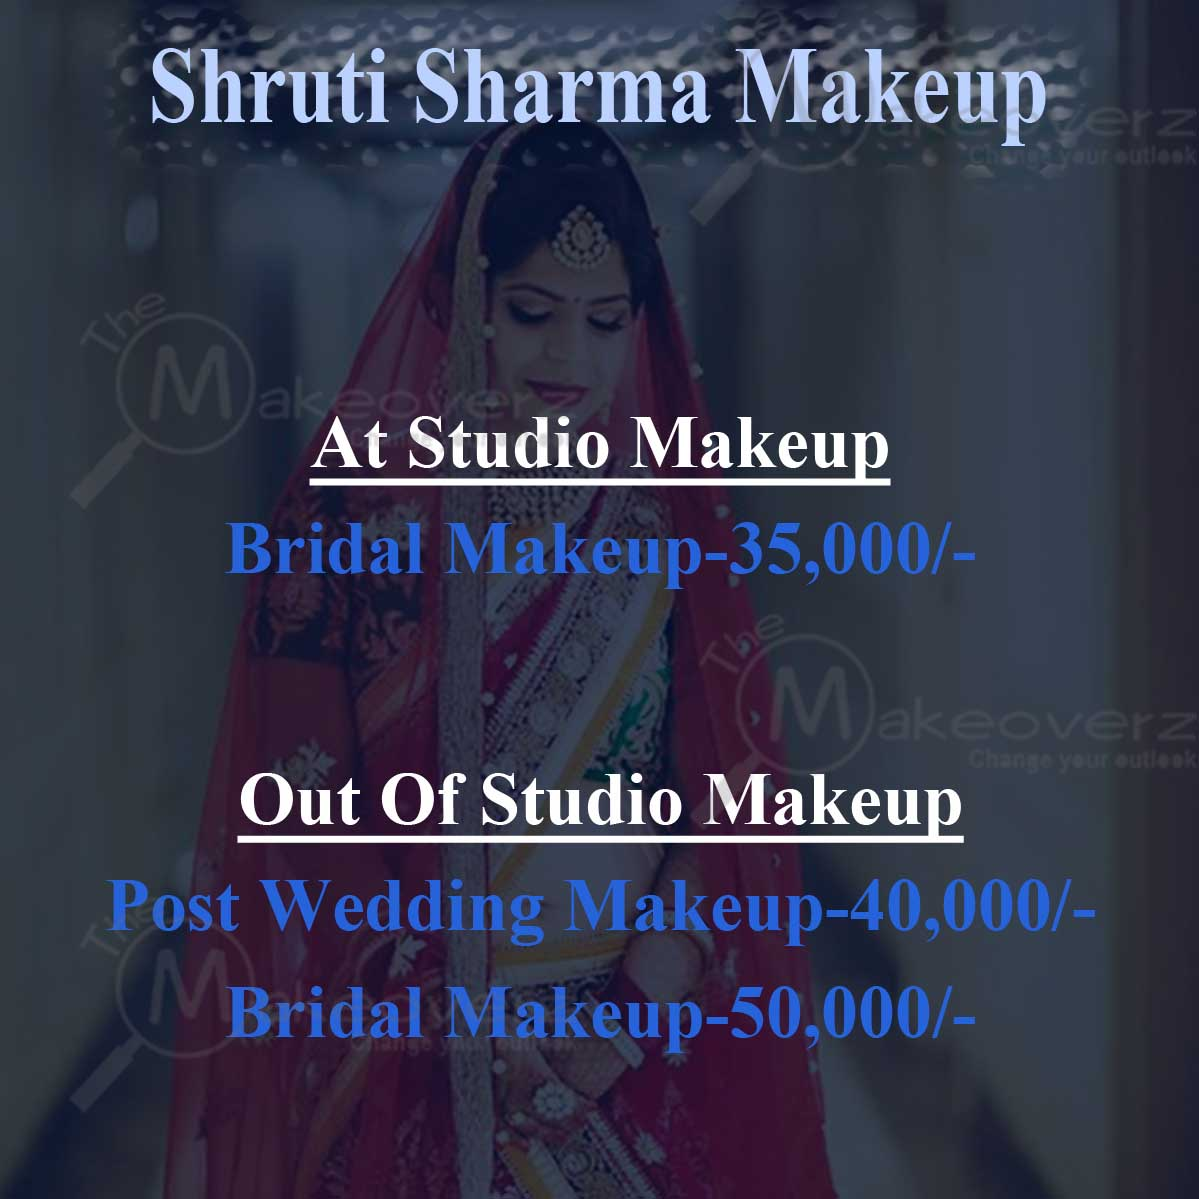 Shruti Sharma Makeup - Chattarpur